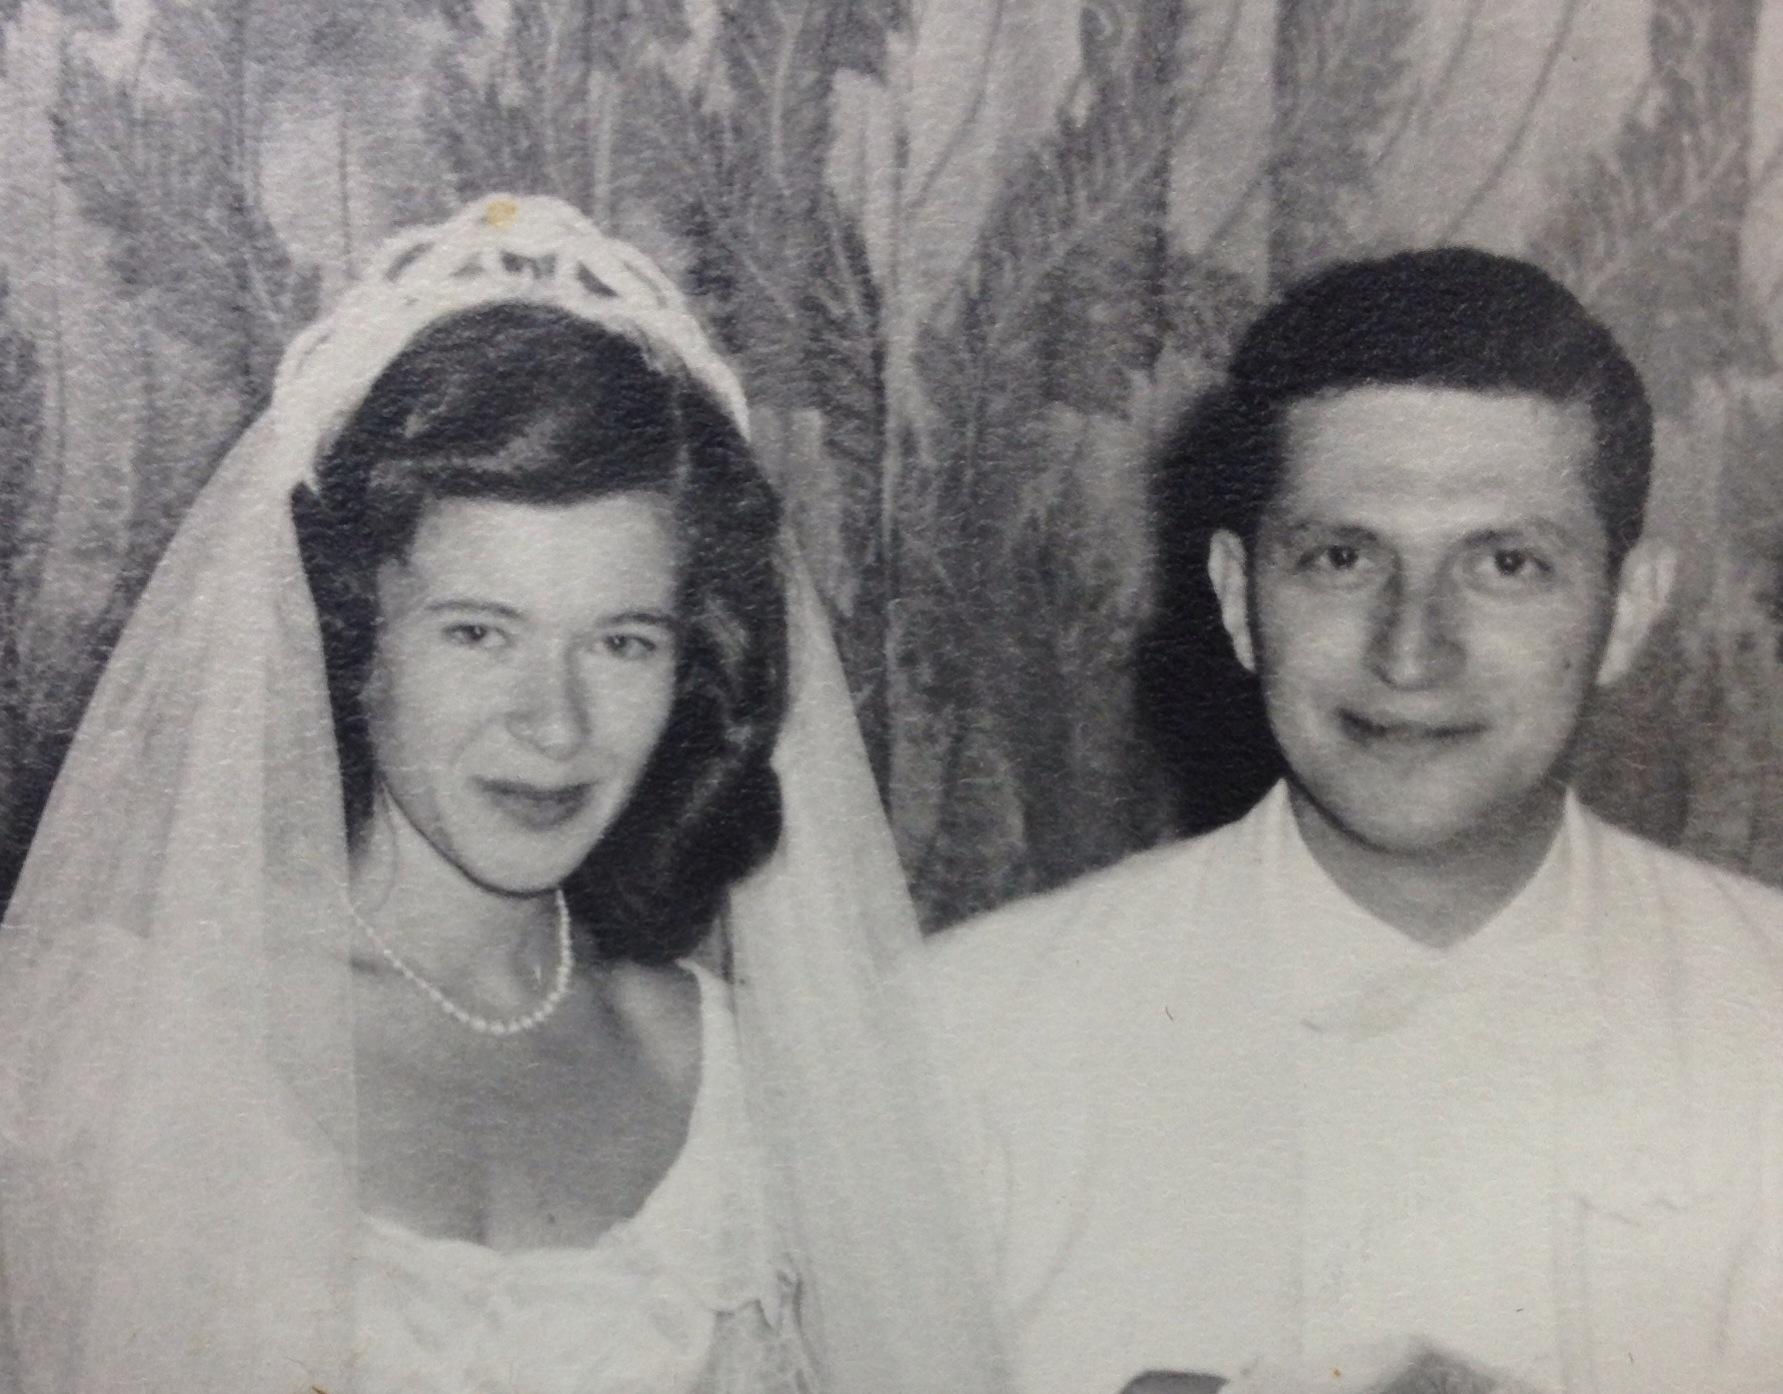 Charles and Bernalee Winter: June 29, 1948